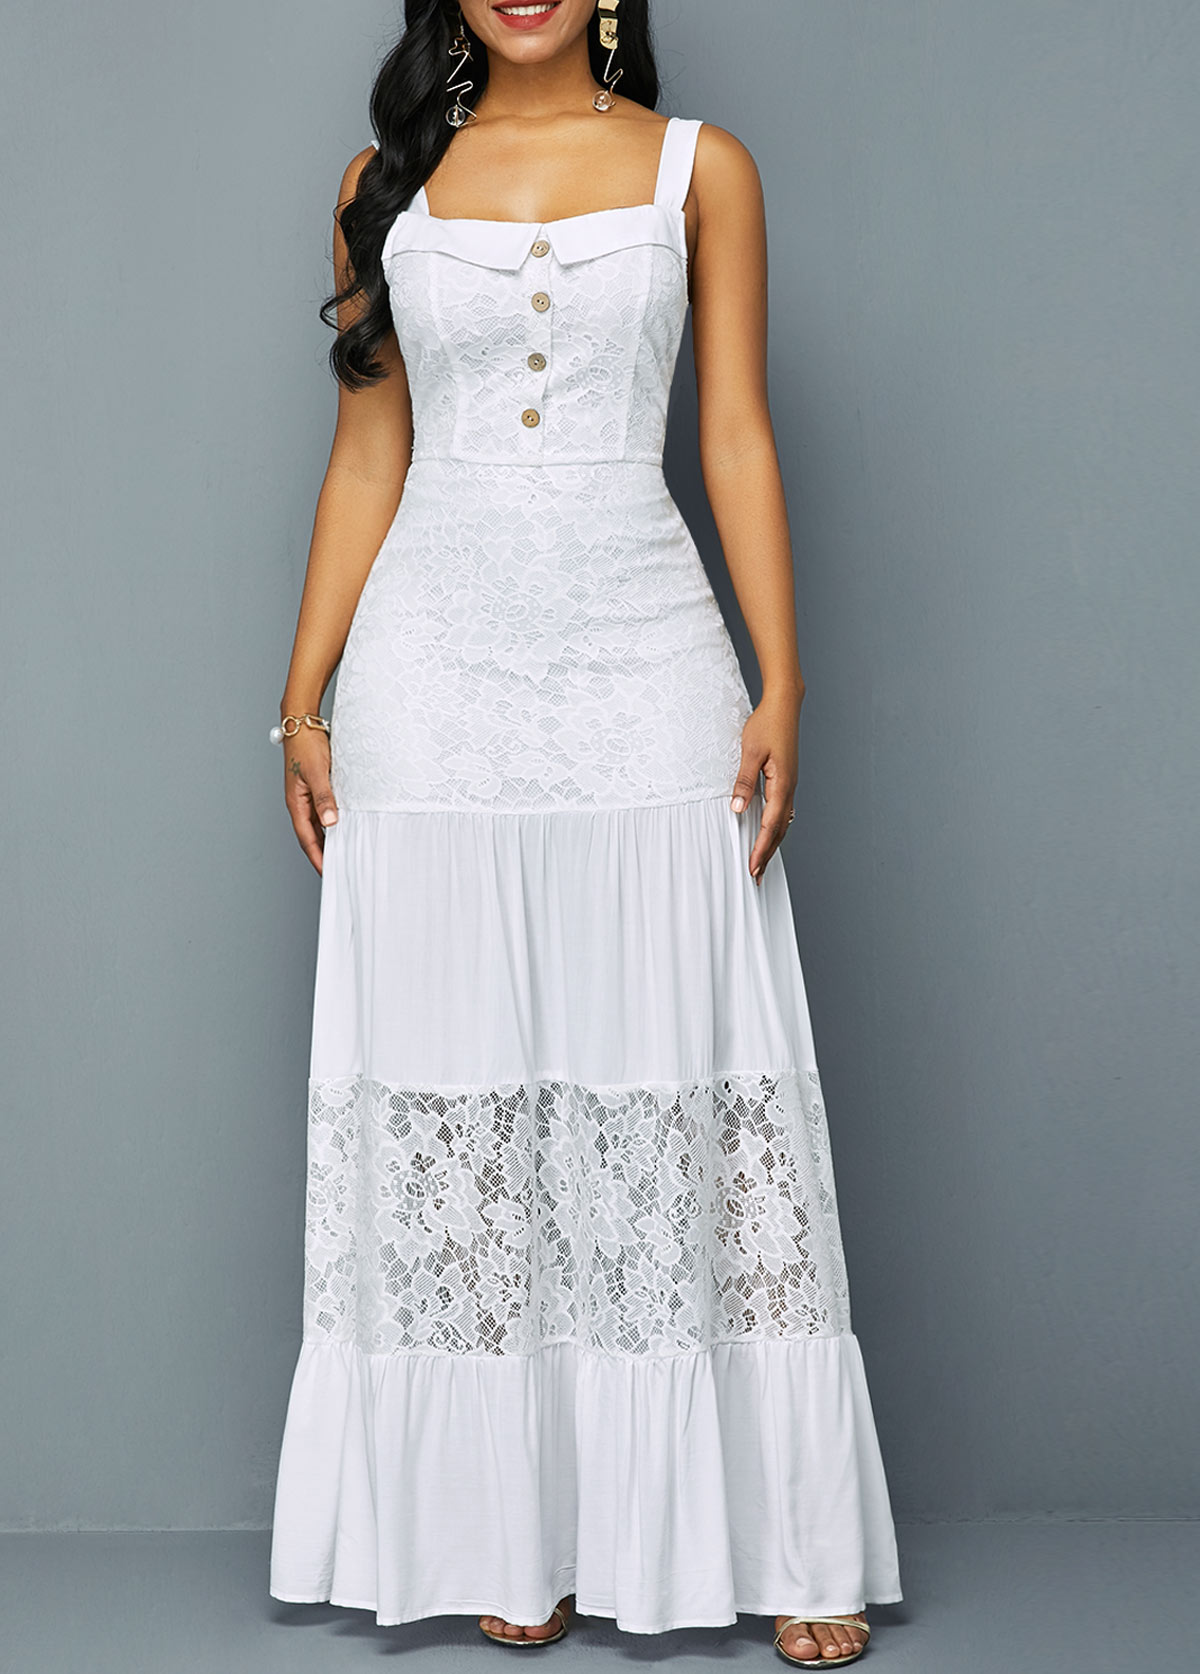 ROTITA Button Detail Ruffle Hem Lace Patchwork Dress